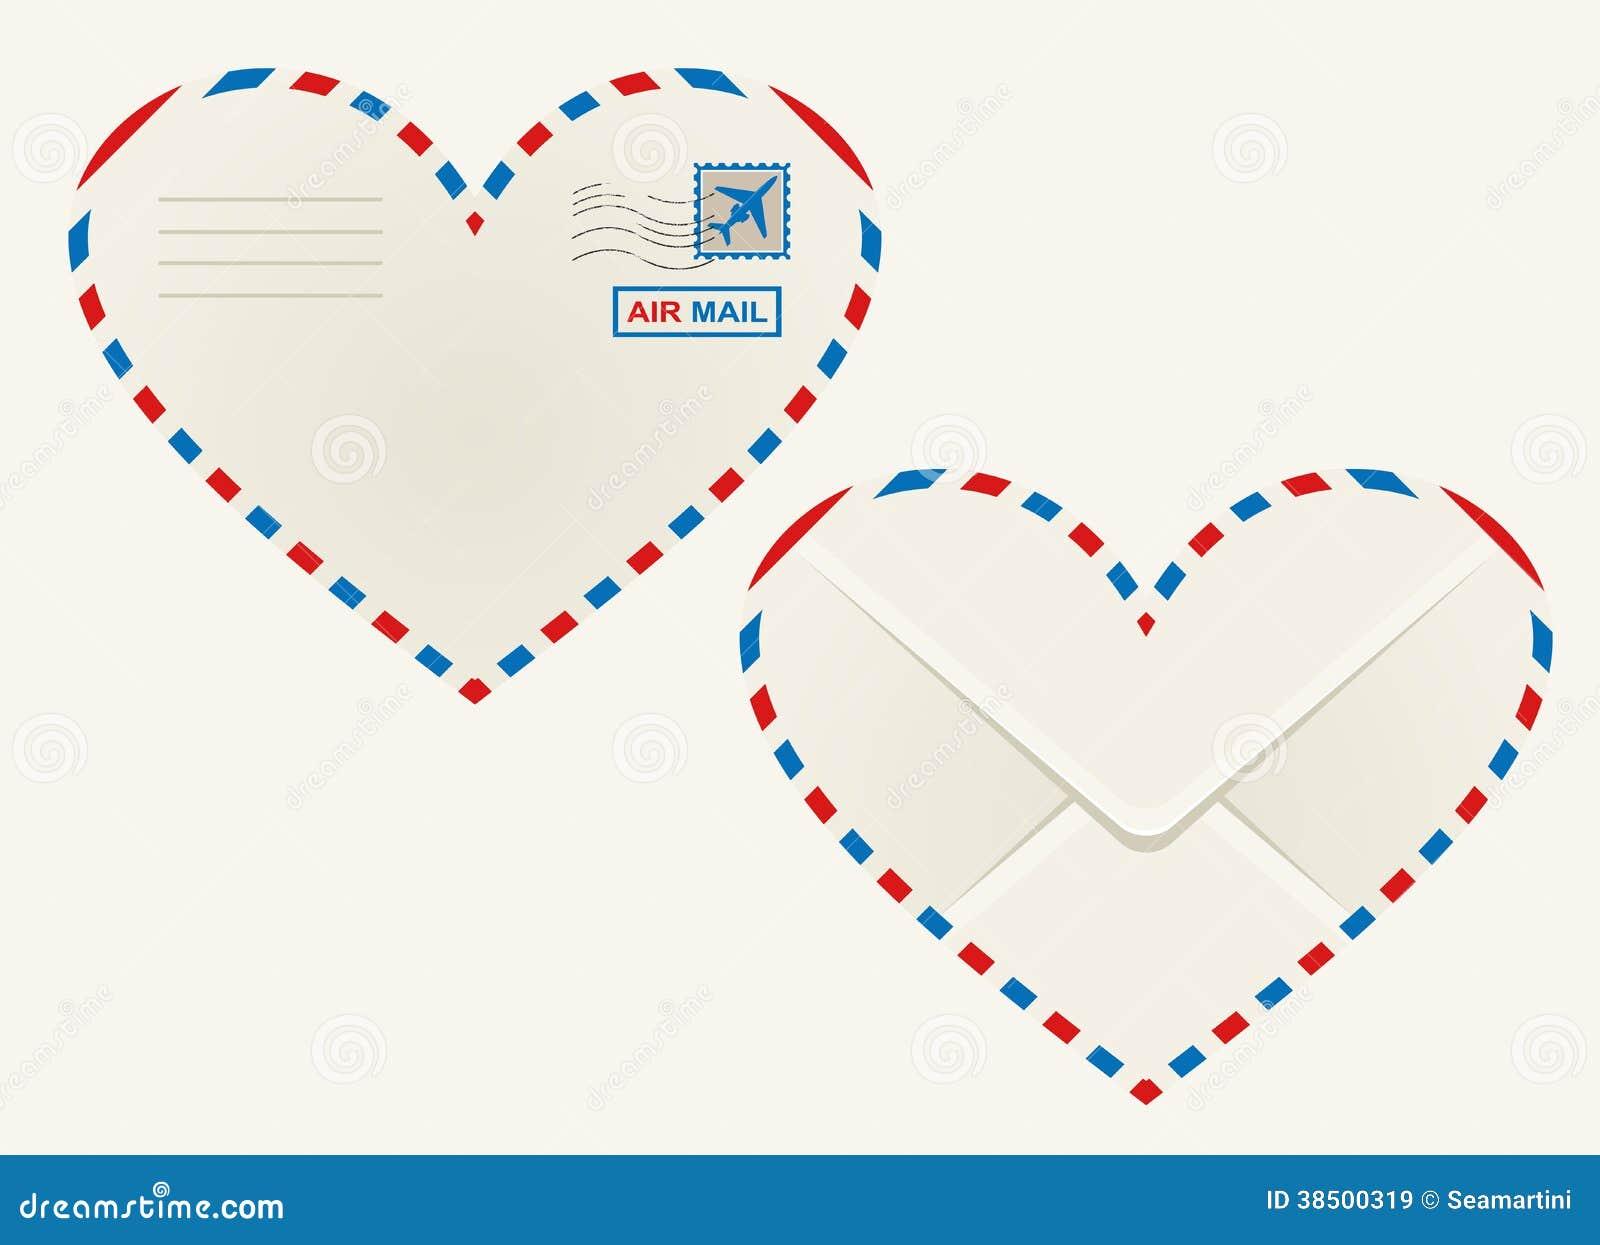 Heart Shaped Heart Airmail Envelope Royalty Free Stock